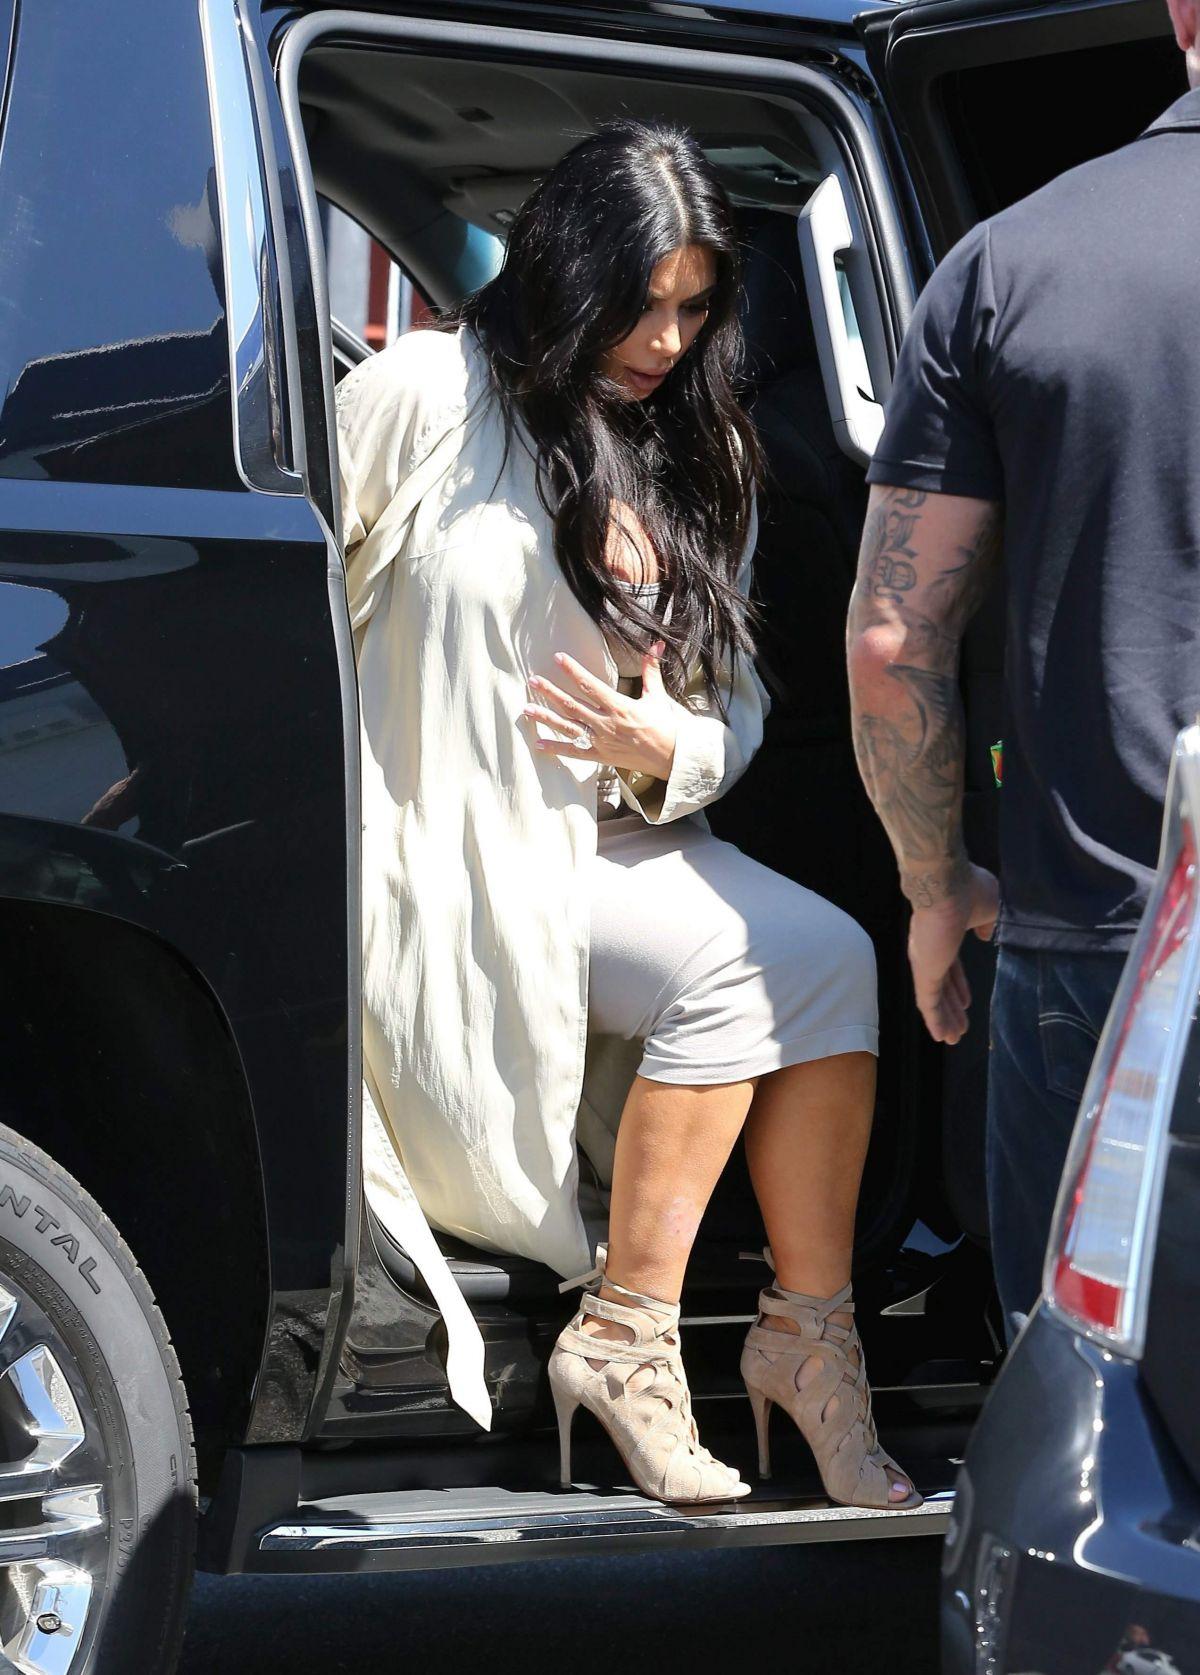 Kim Kardashian Nipple Slip (2 Photos)